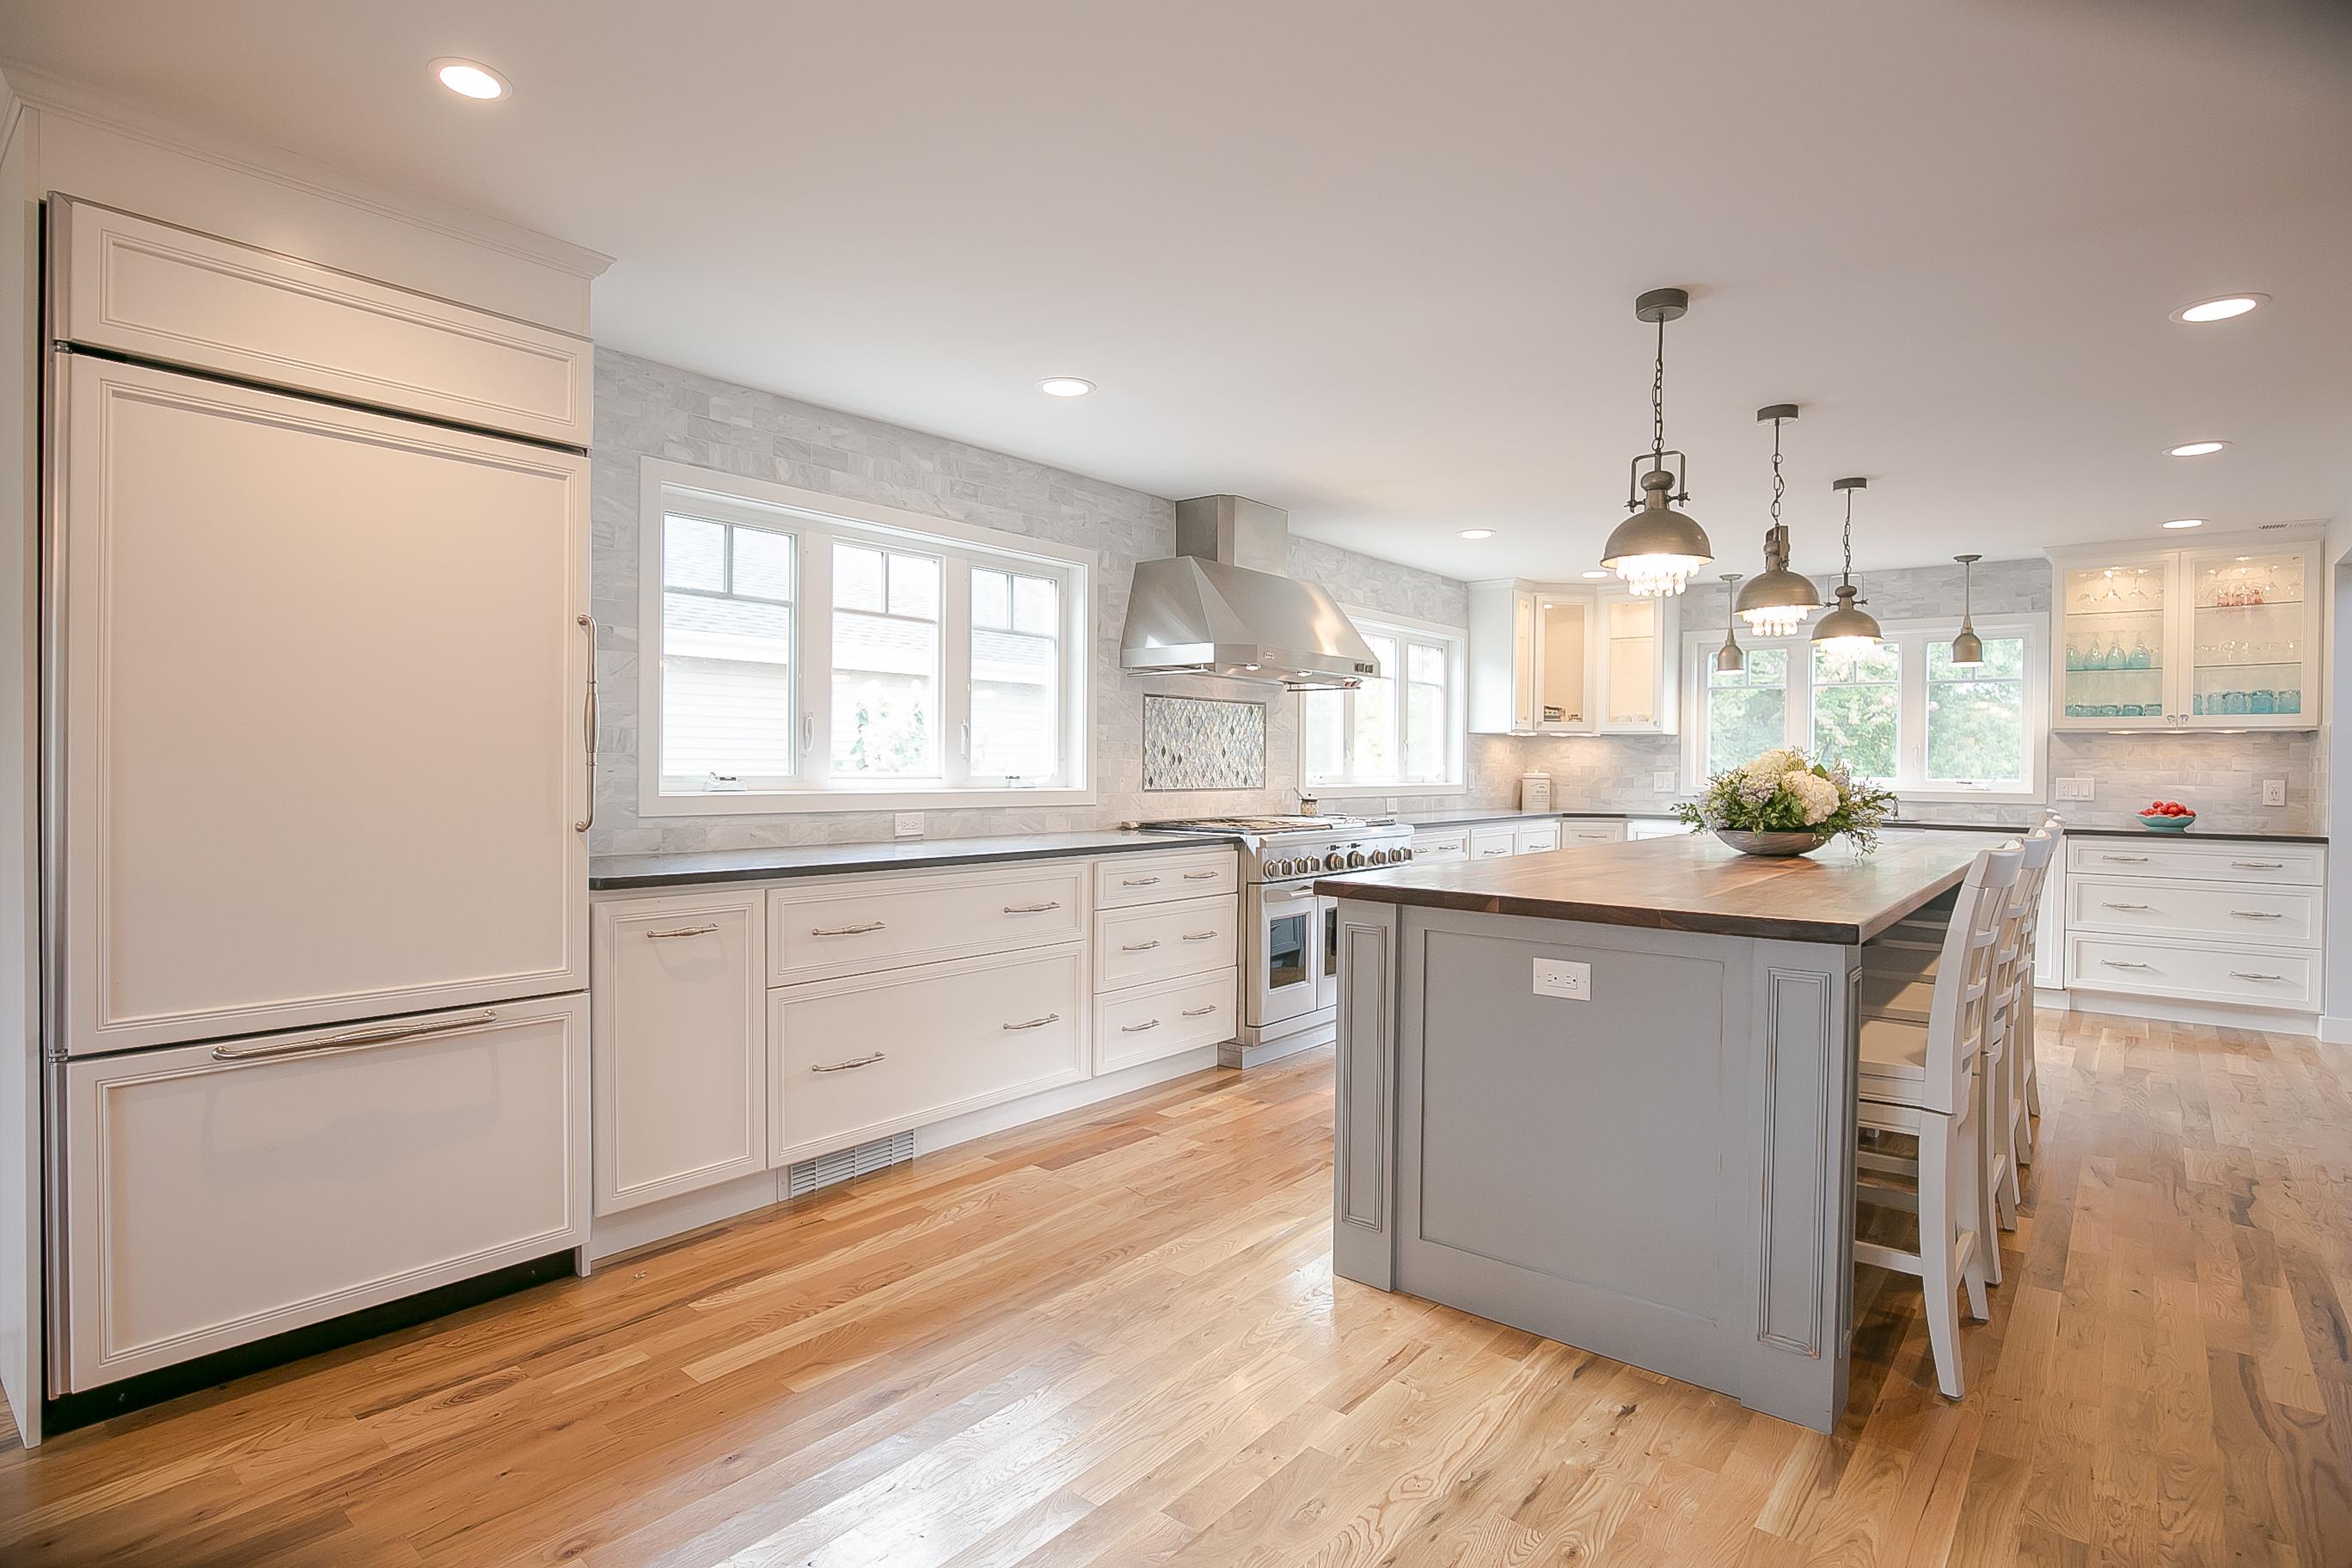 white transitional kitchen, quartz countertop, walnut countertop